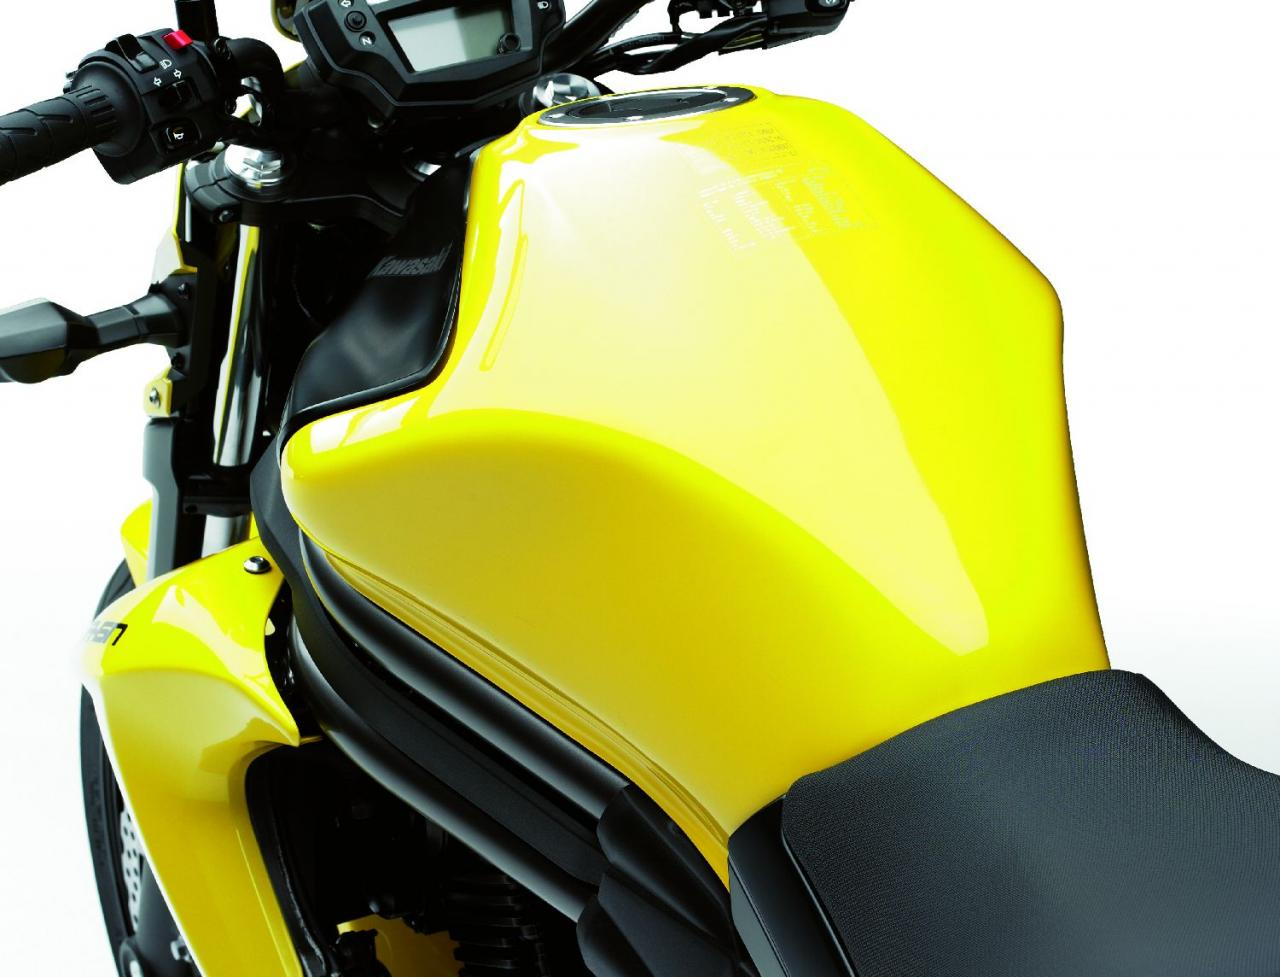 2006 Kawasaki Ninja 650r Wiring Diagram Headlight